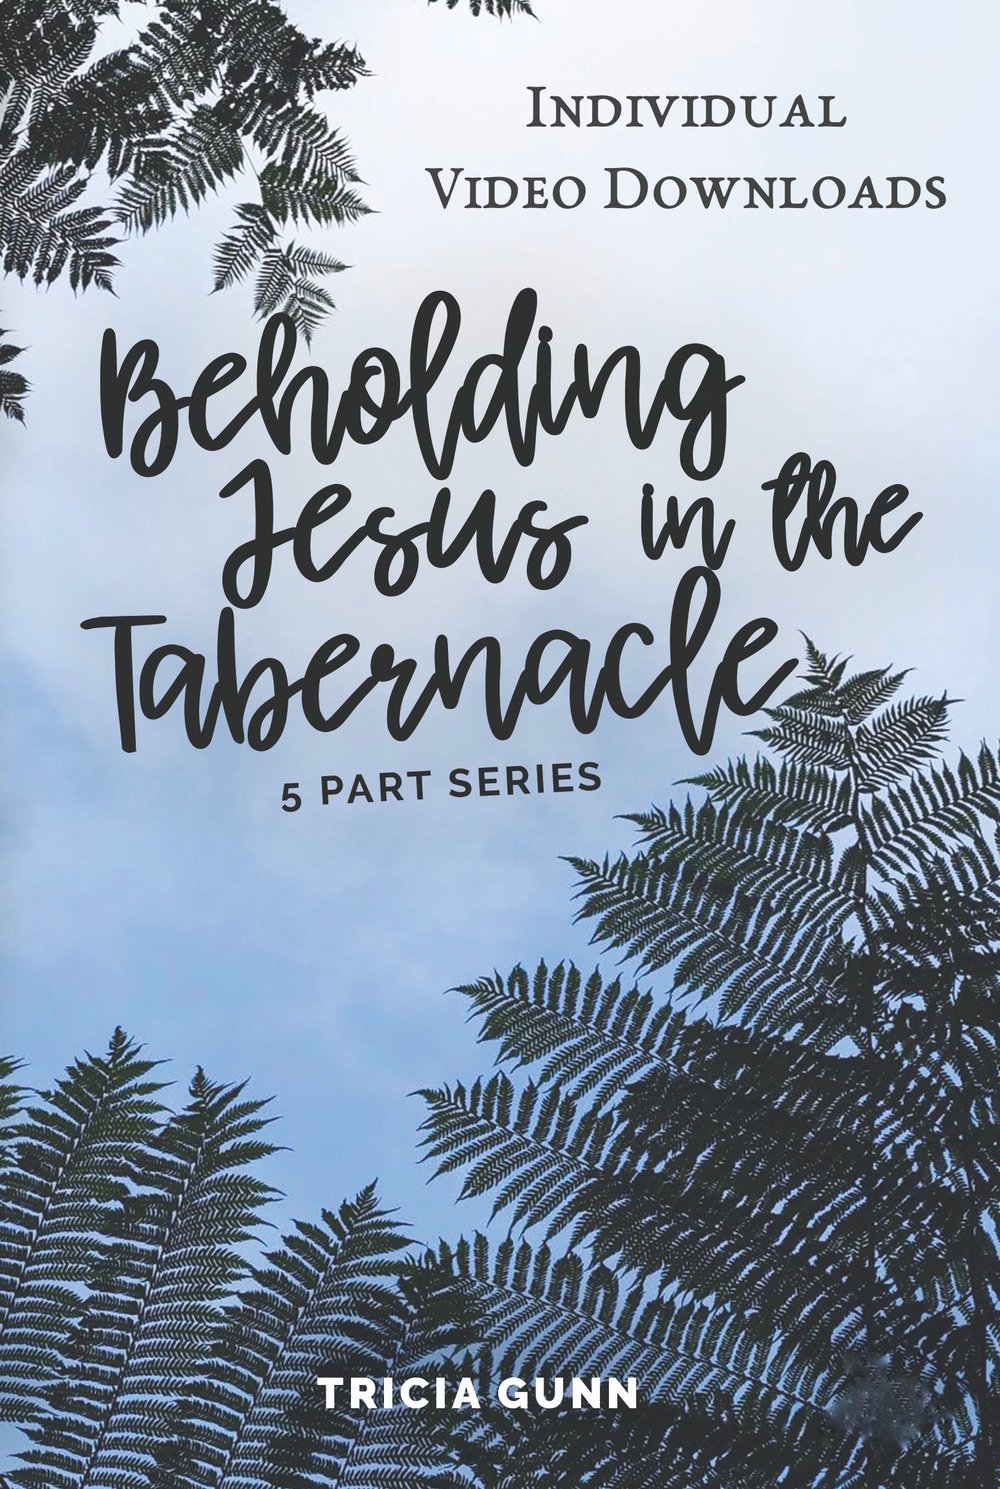 Beholding-Jesus-DVD-01, video individual.jpg